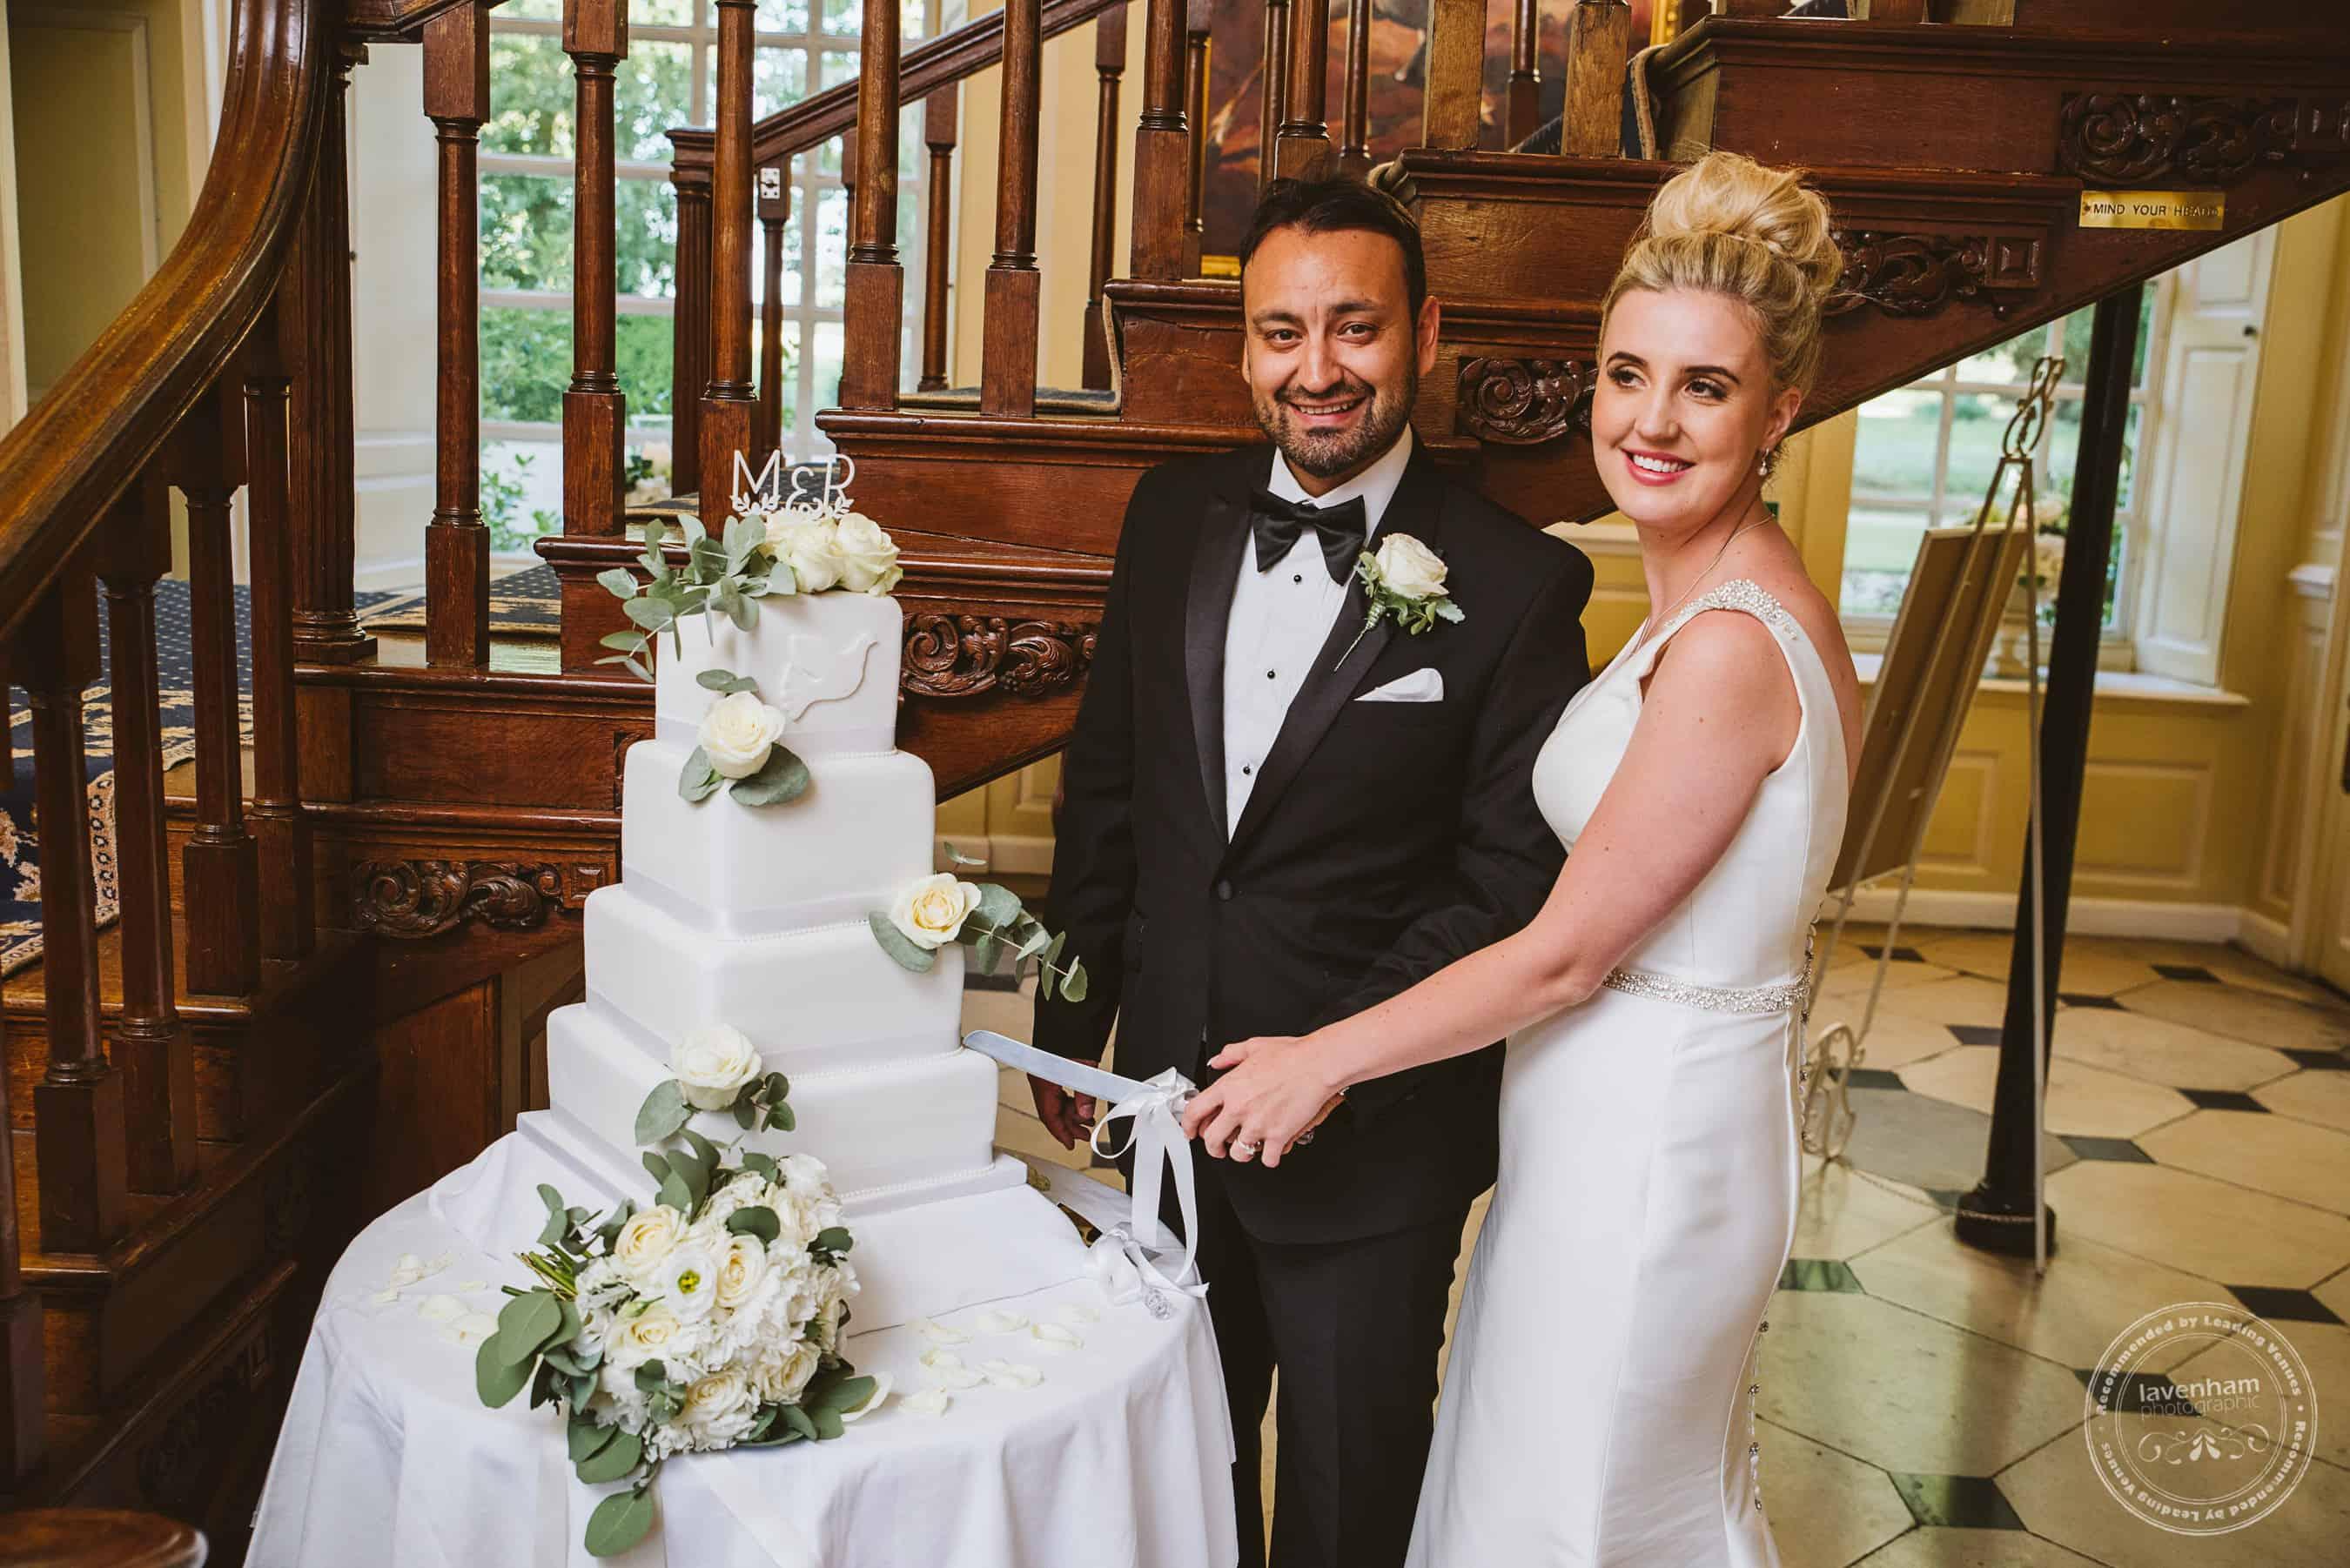 220618 Gosfield Hall Wedding Photography Lavenham Photographic 0165